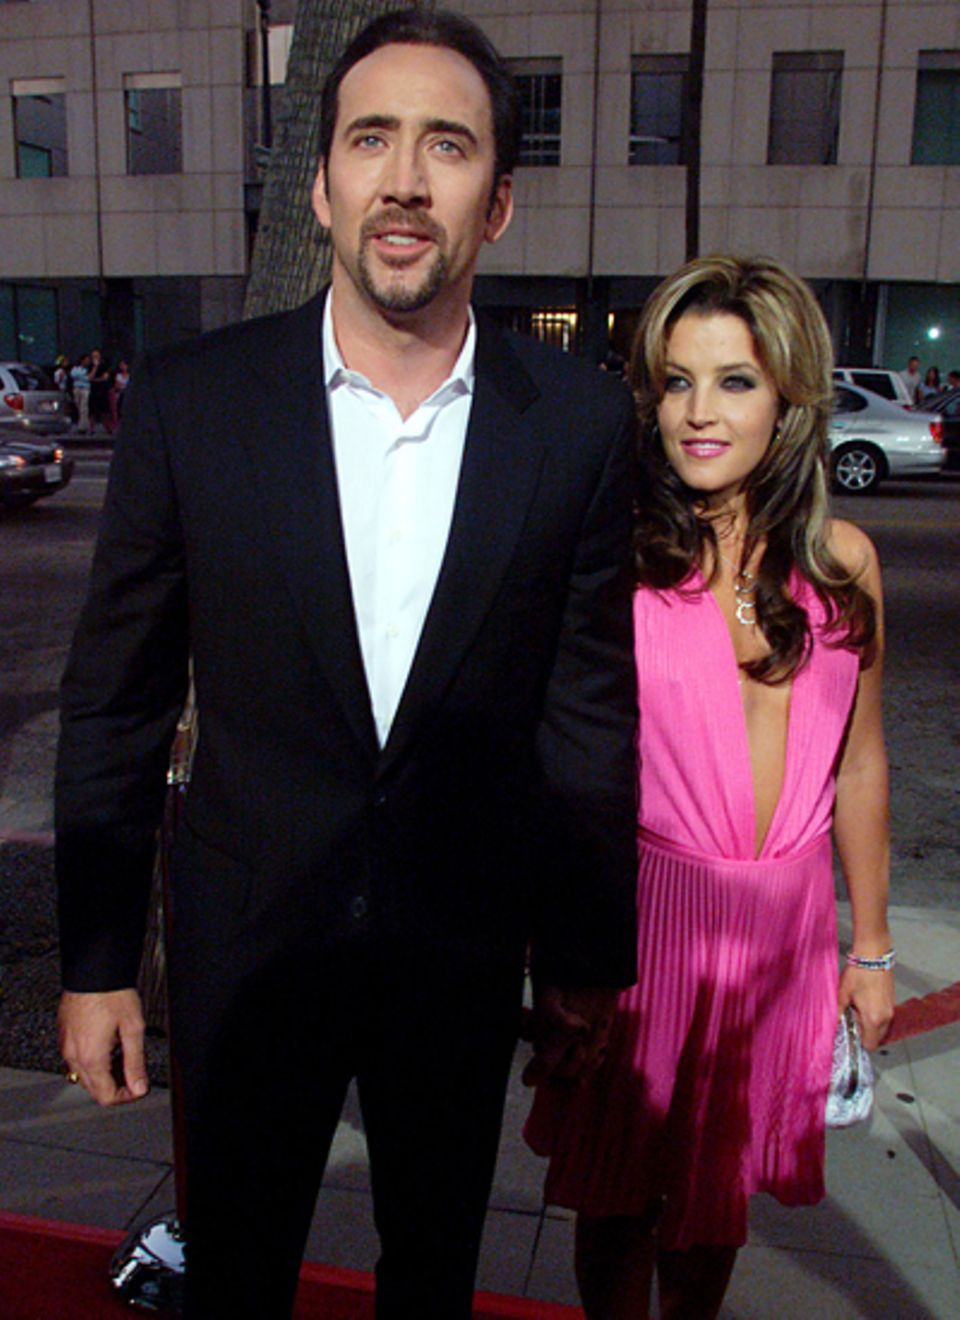 Nicolas Cage und Lisa-Marie Presley : Vier Jahre lang sind Schauspieler Nicolas Cage und Lisa-Marie Presley ein Paar. Beide lass